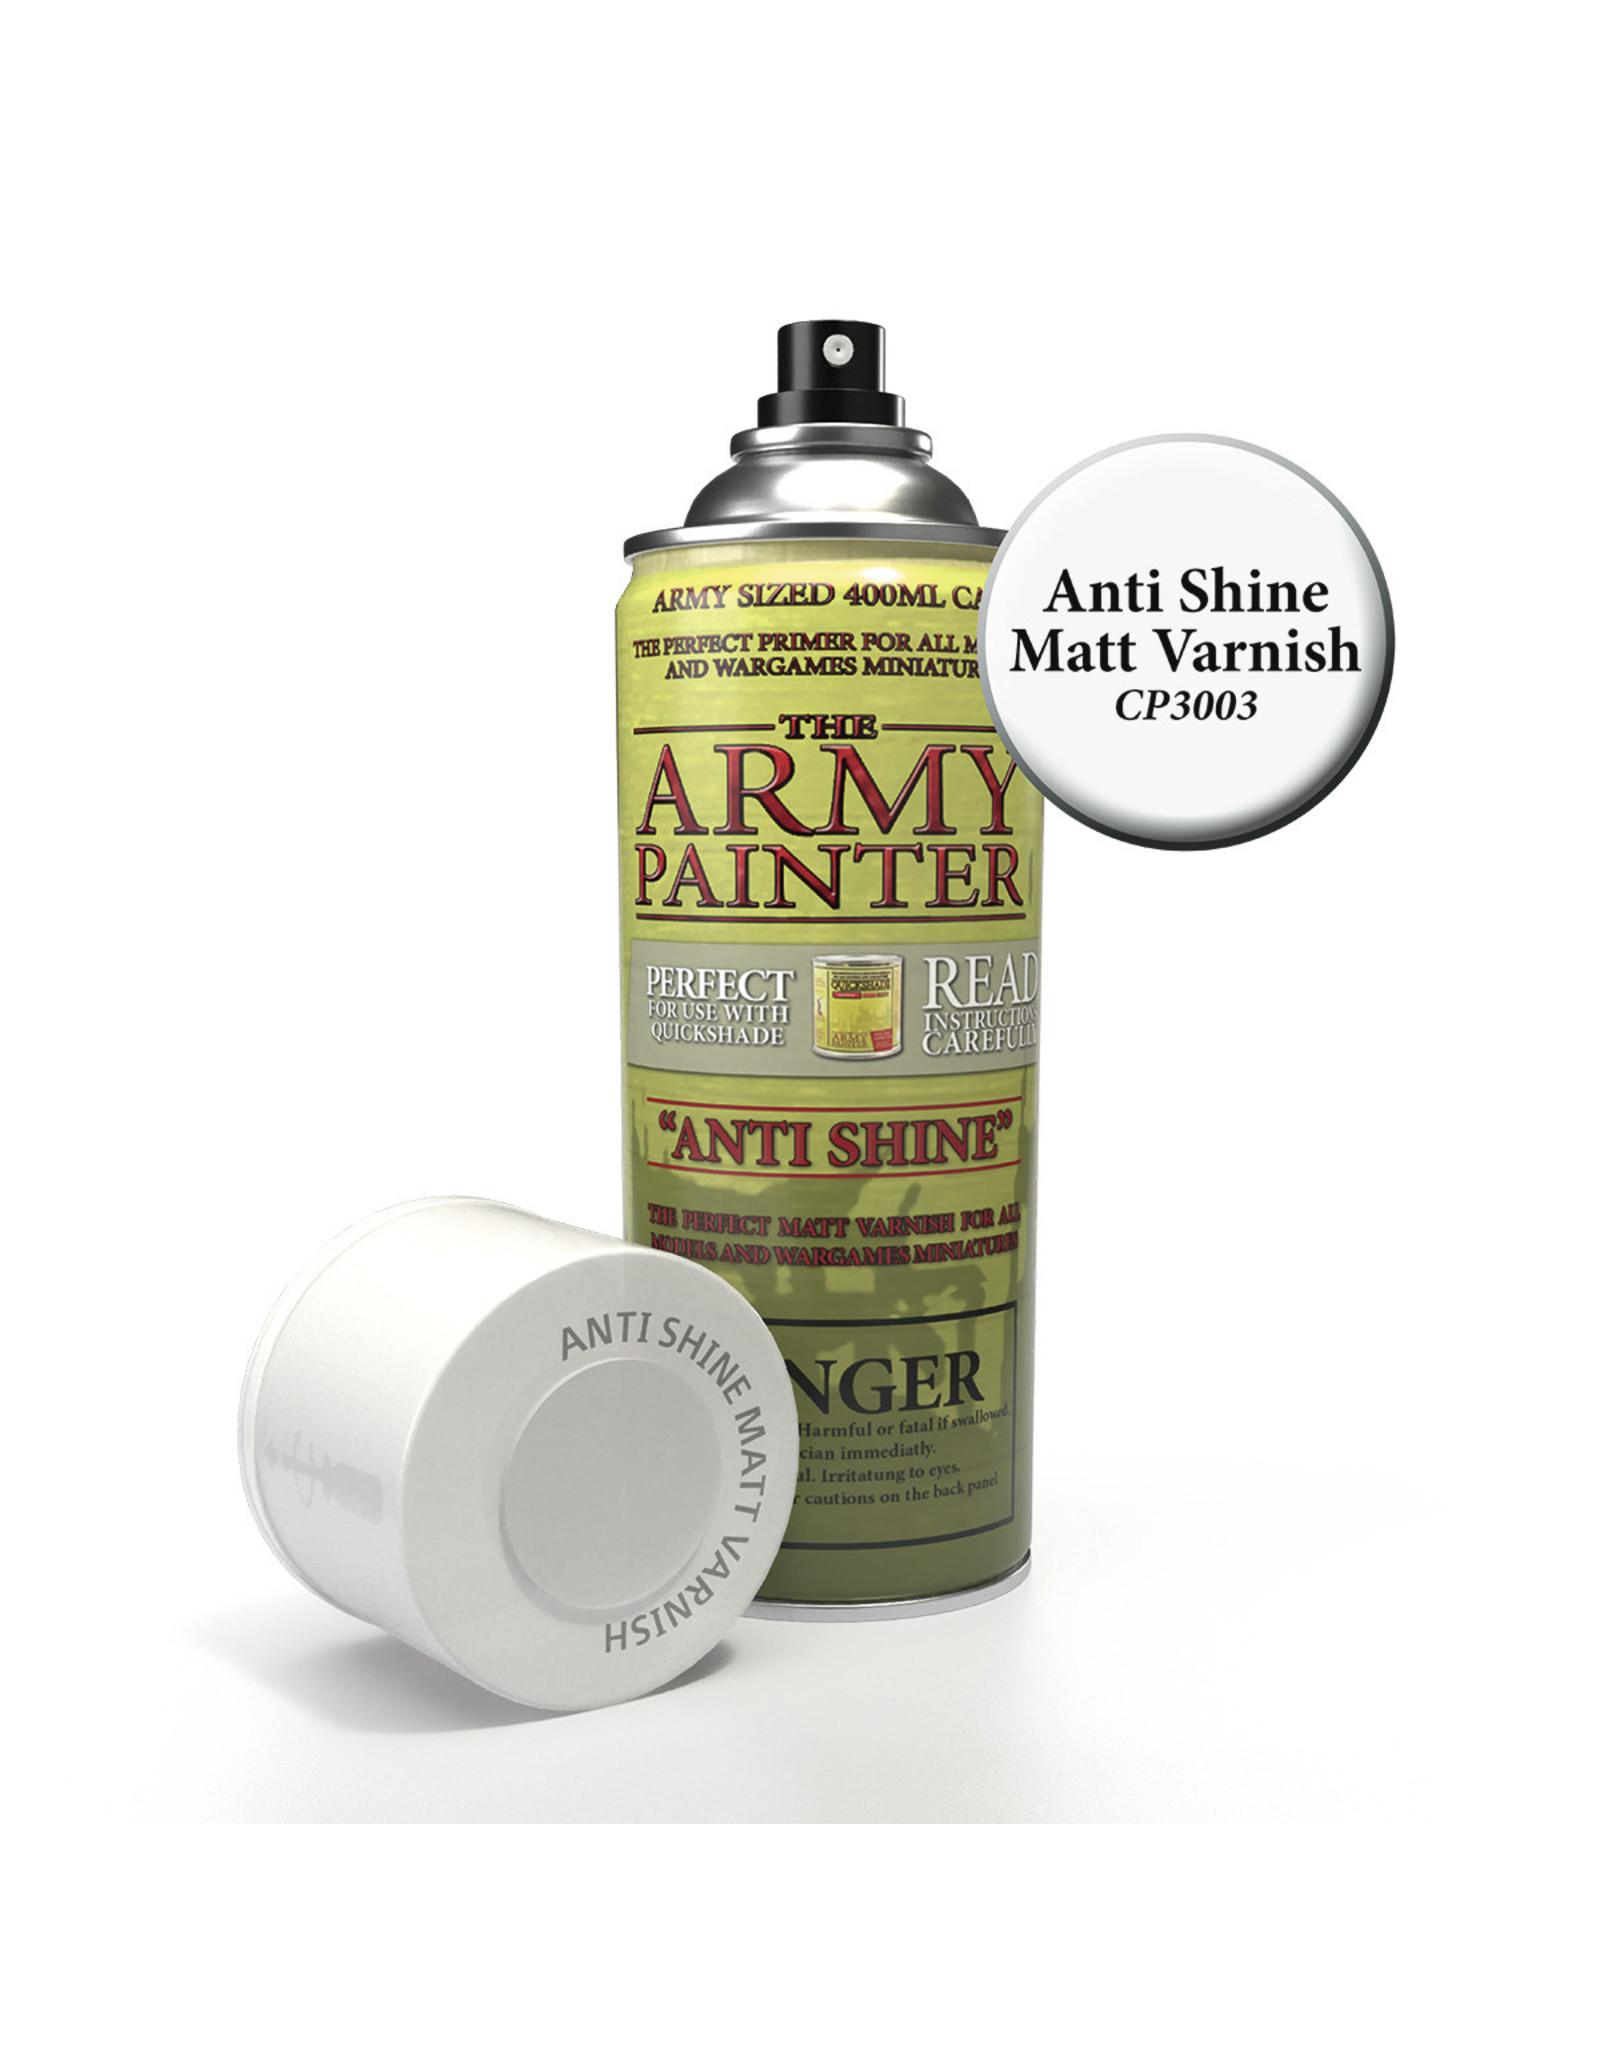 Army Painter Army Painter - Anti-Shine Primer - Matt Varnish